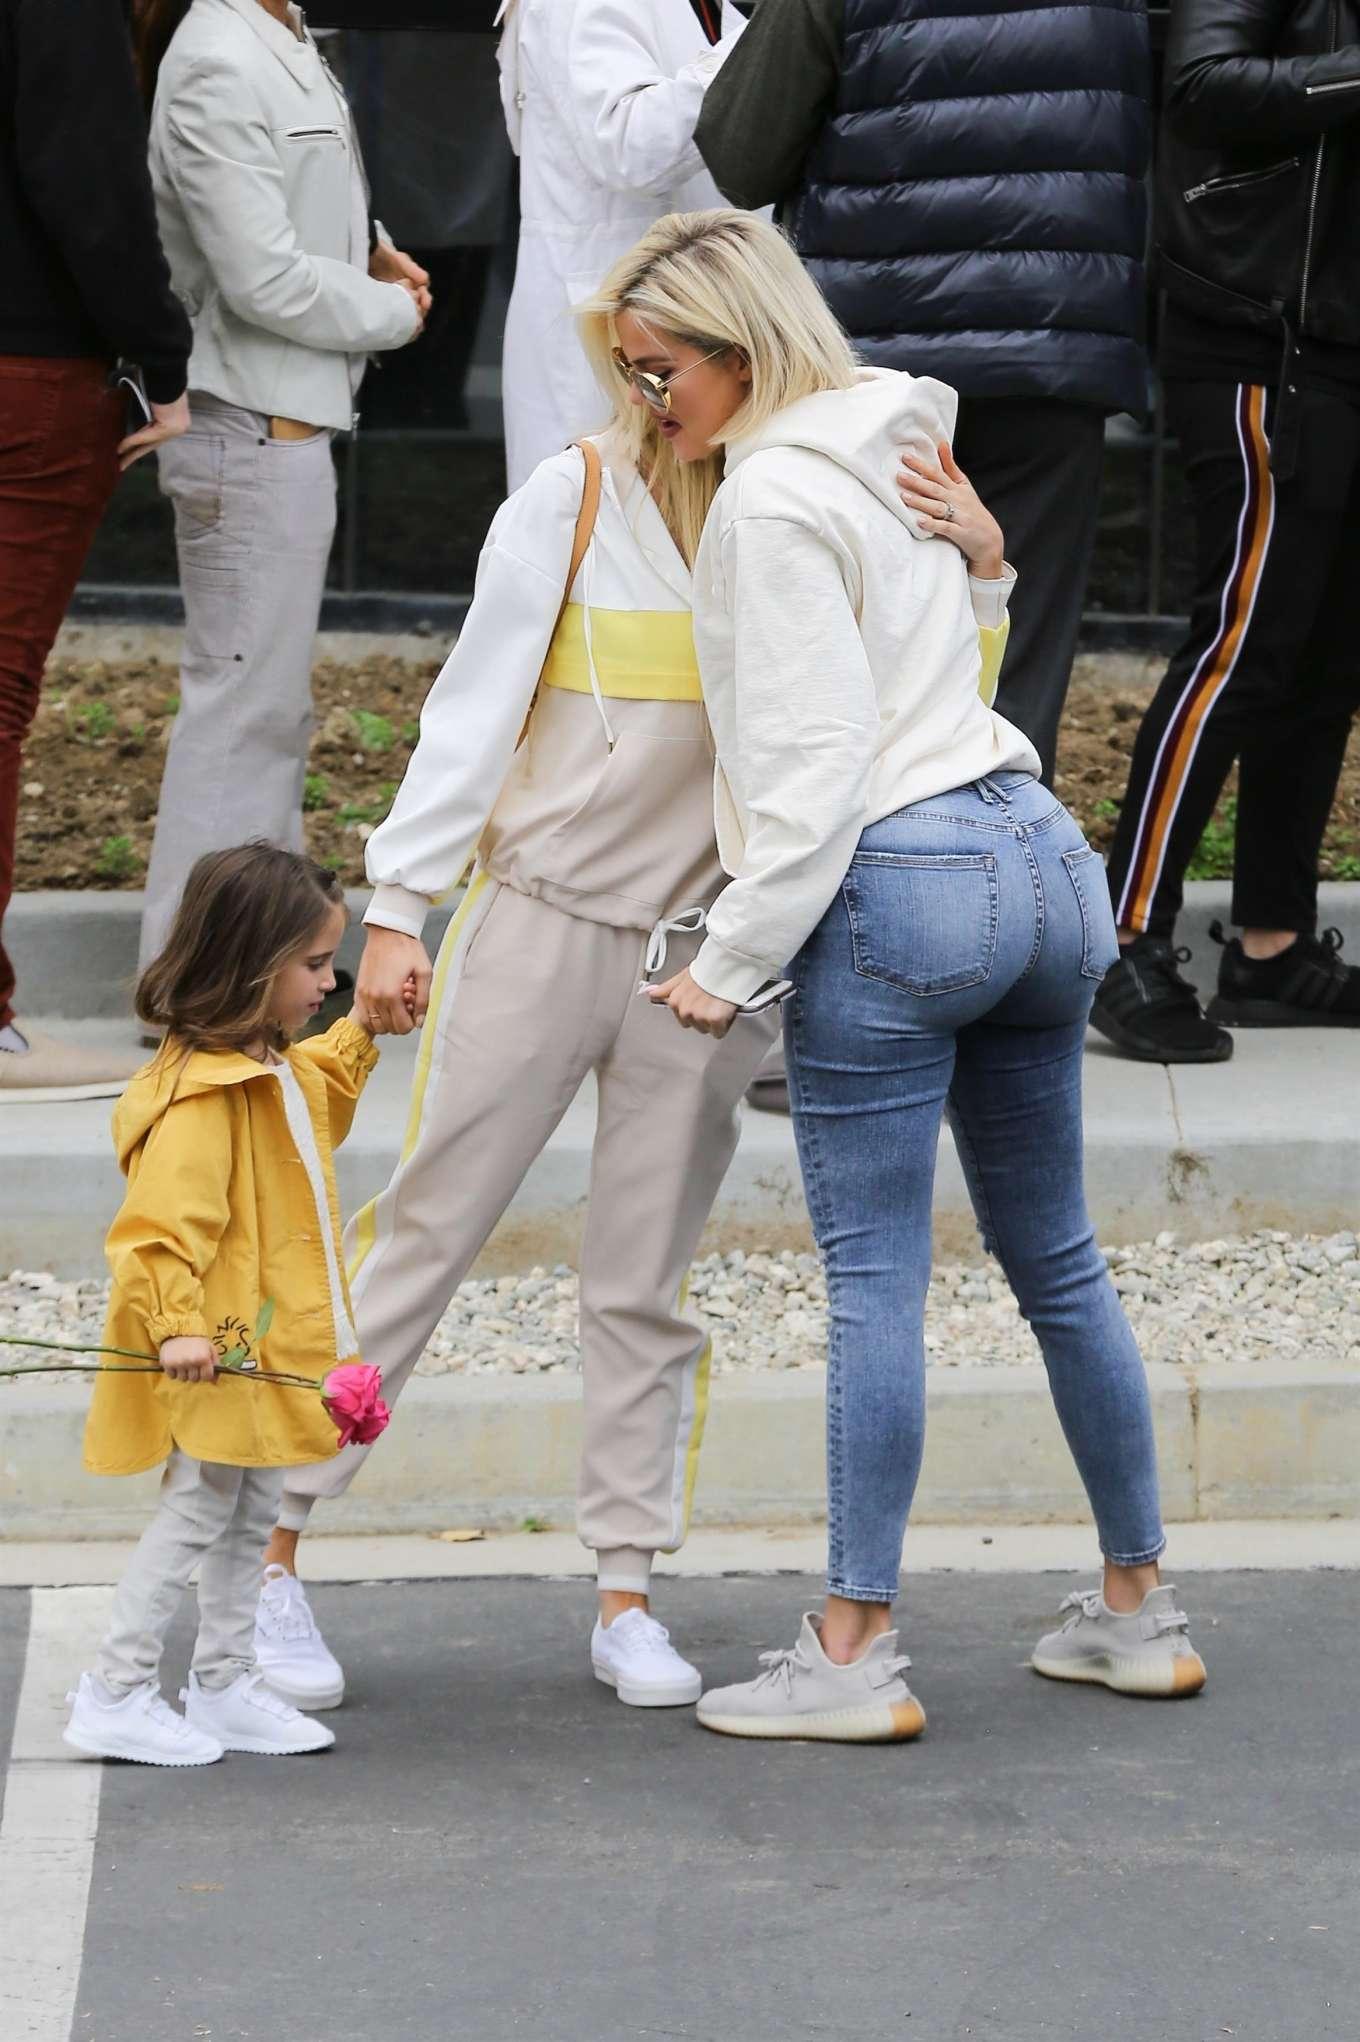 Khloe Kardashian 2019 : Khloe Kardashian at Kanye Wests Sunday church services-02